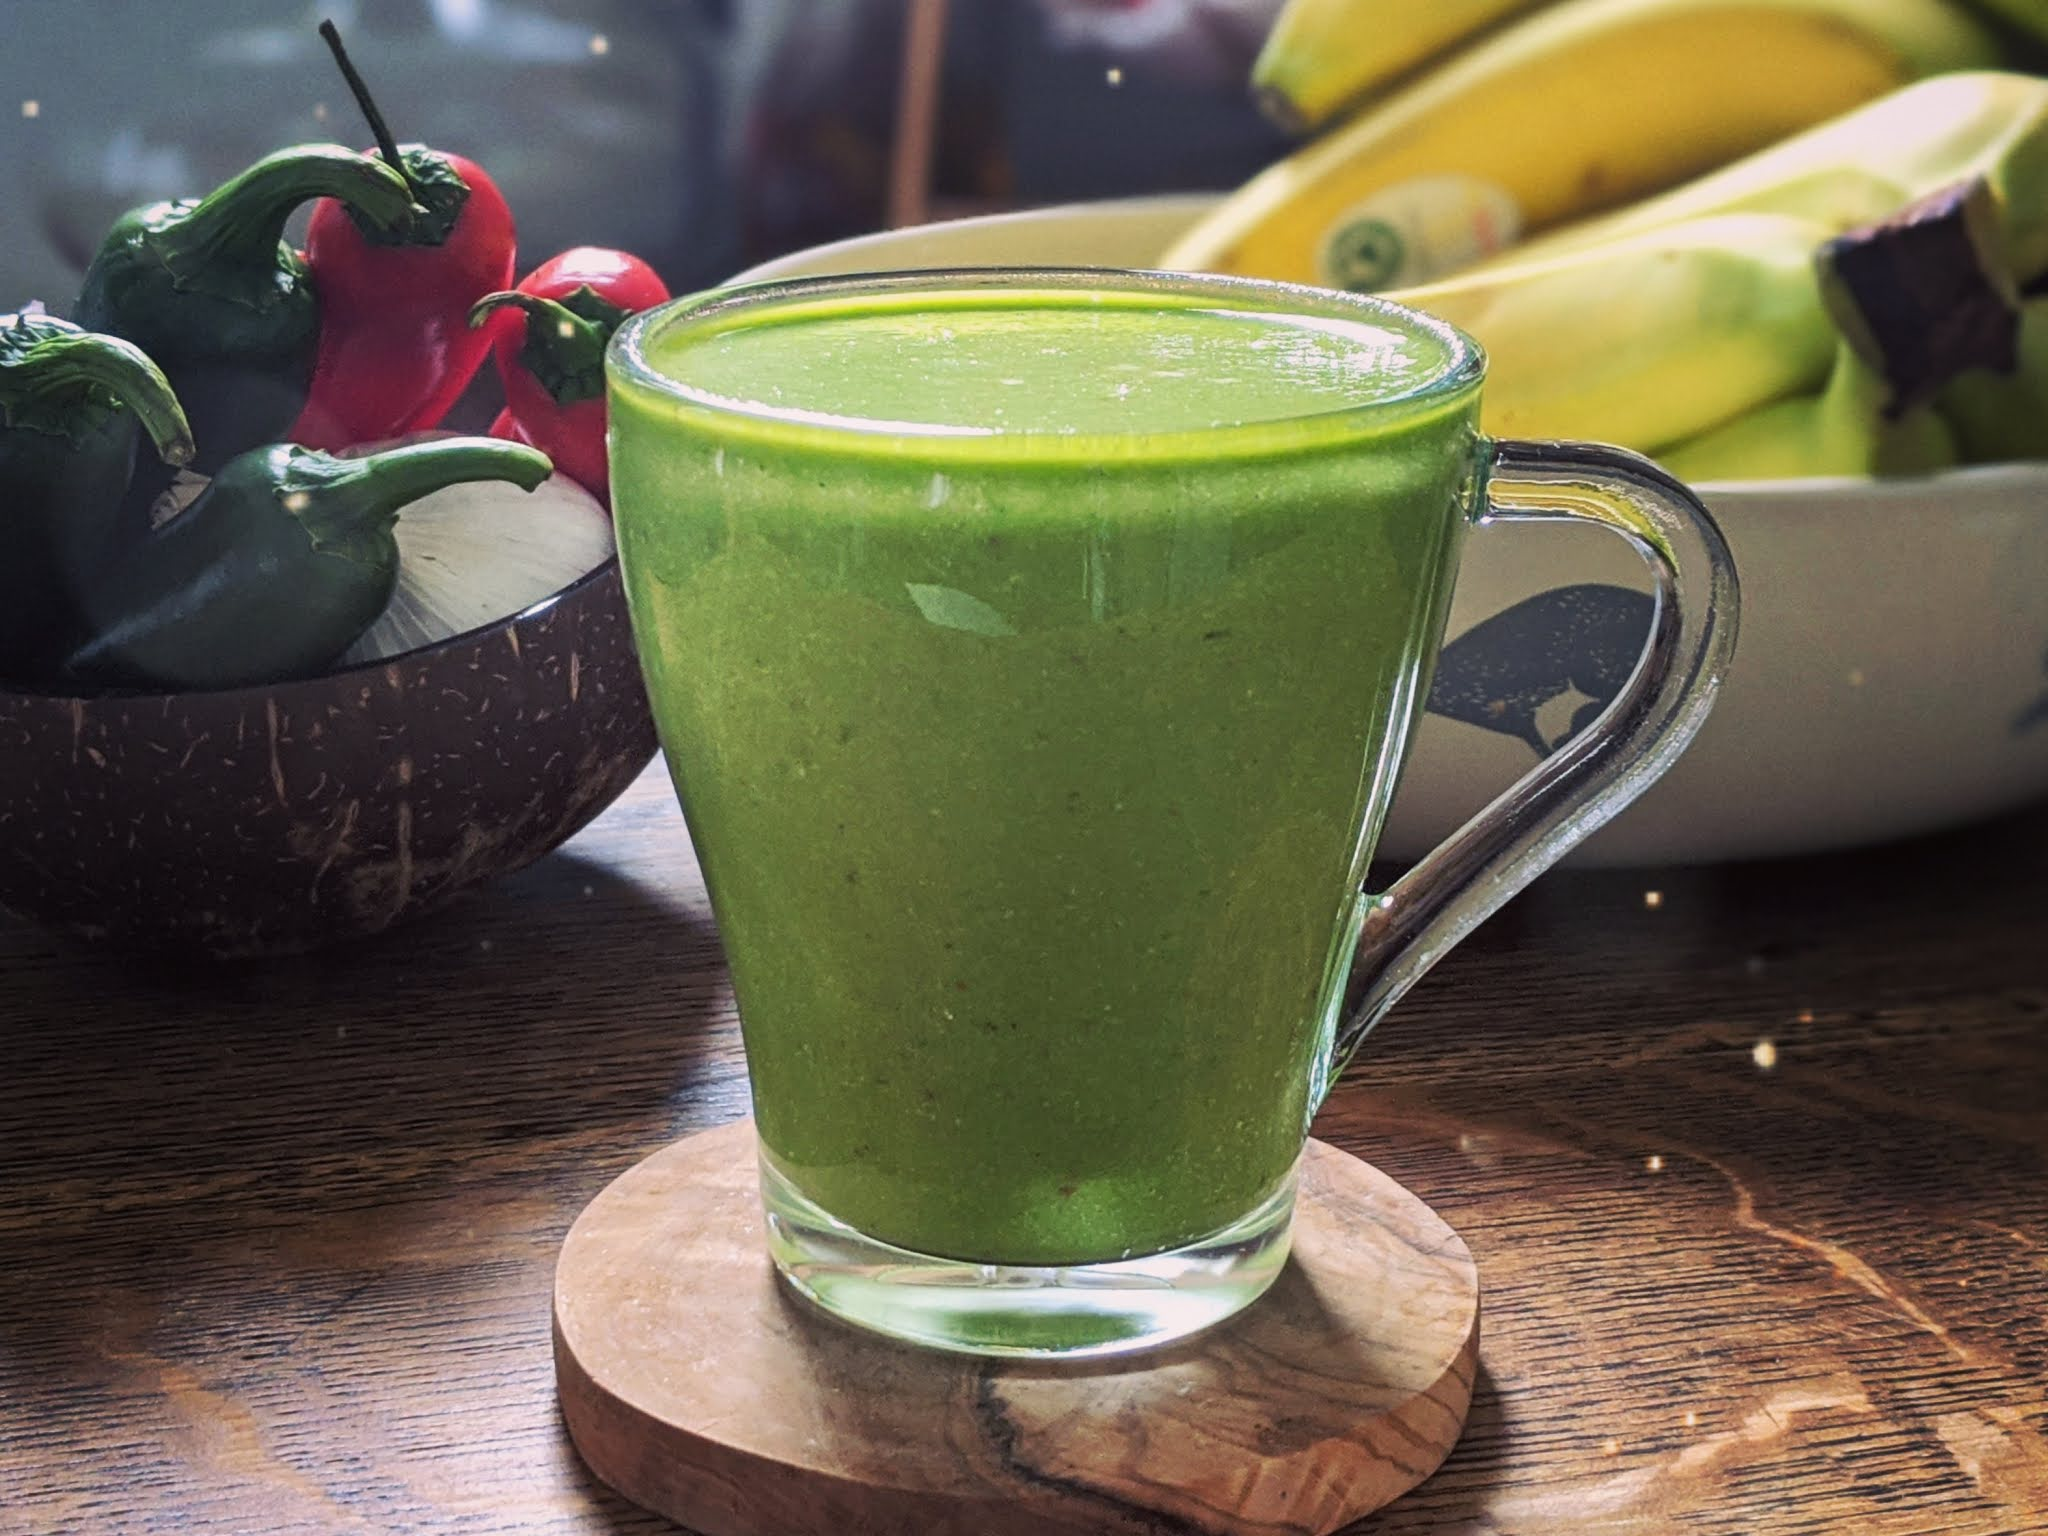 Green Smoothie littlepackofvegans